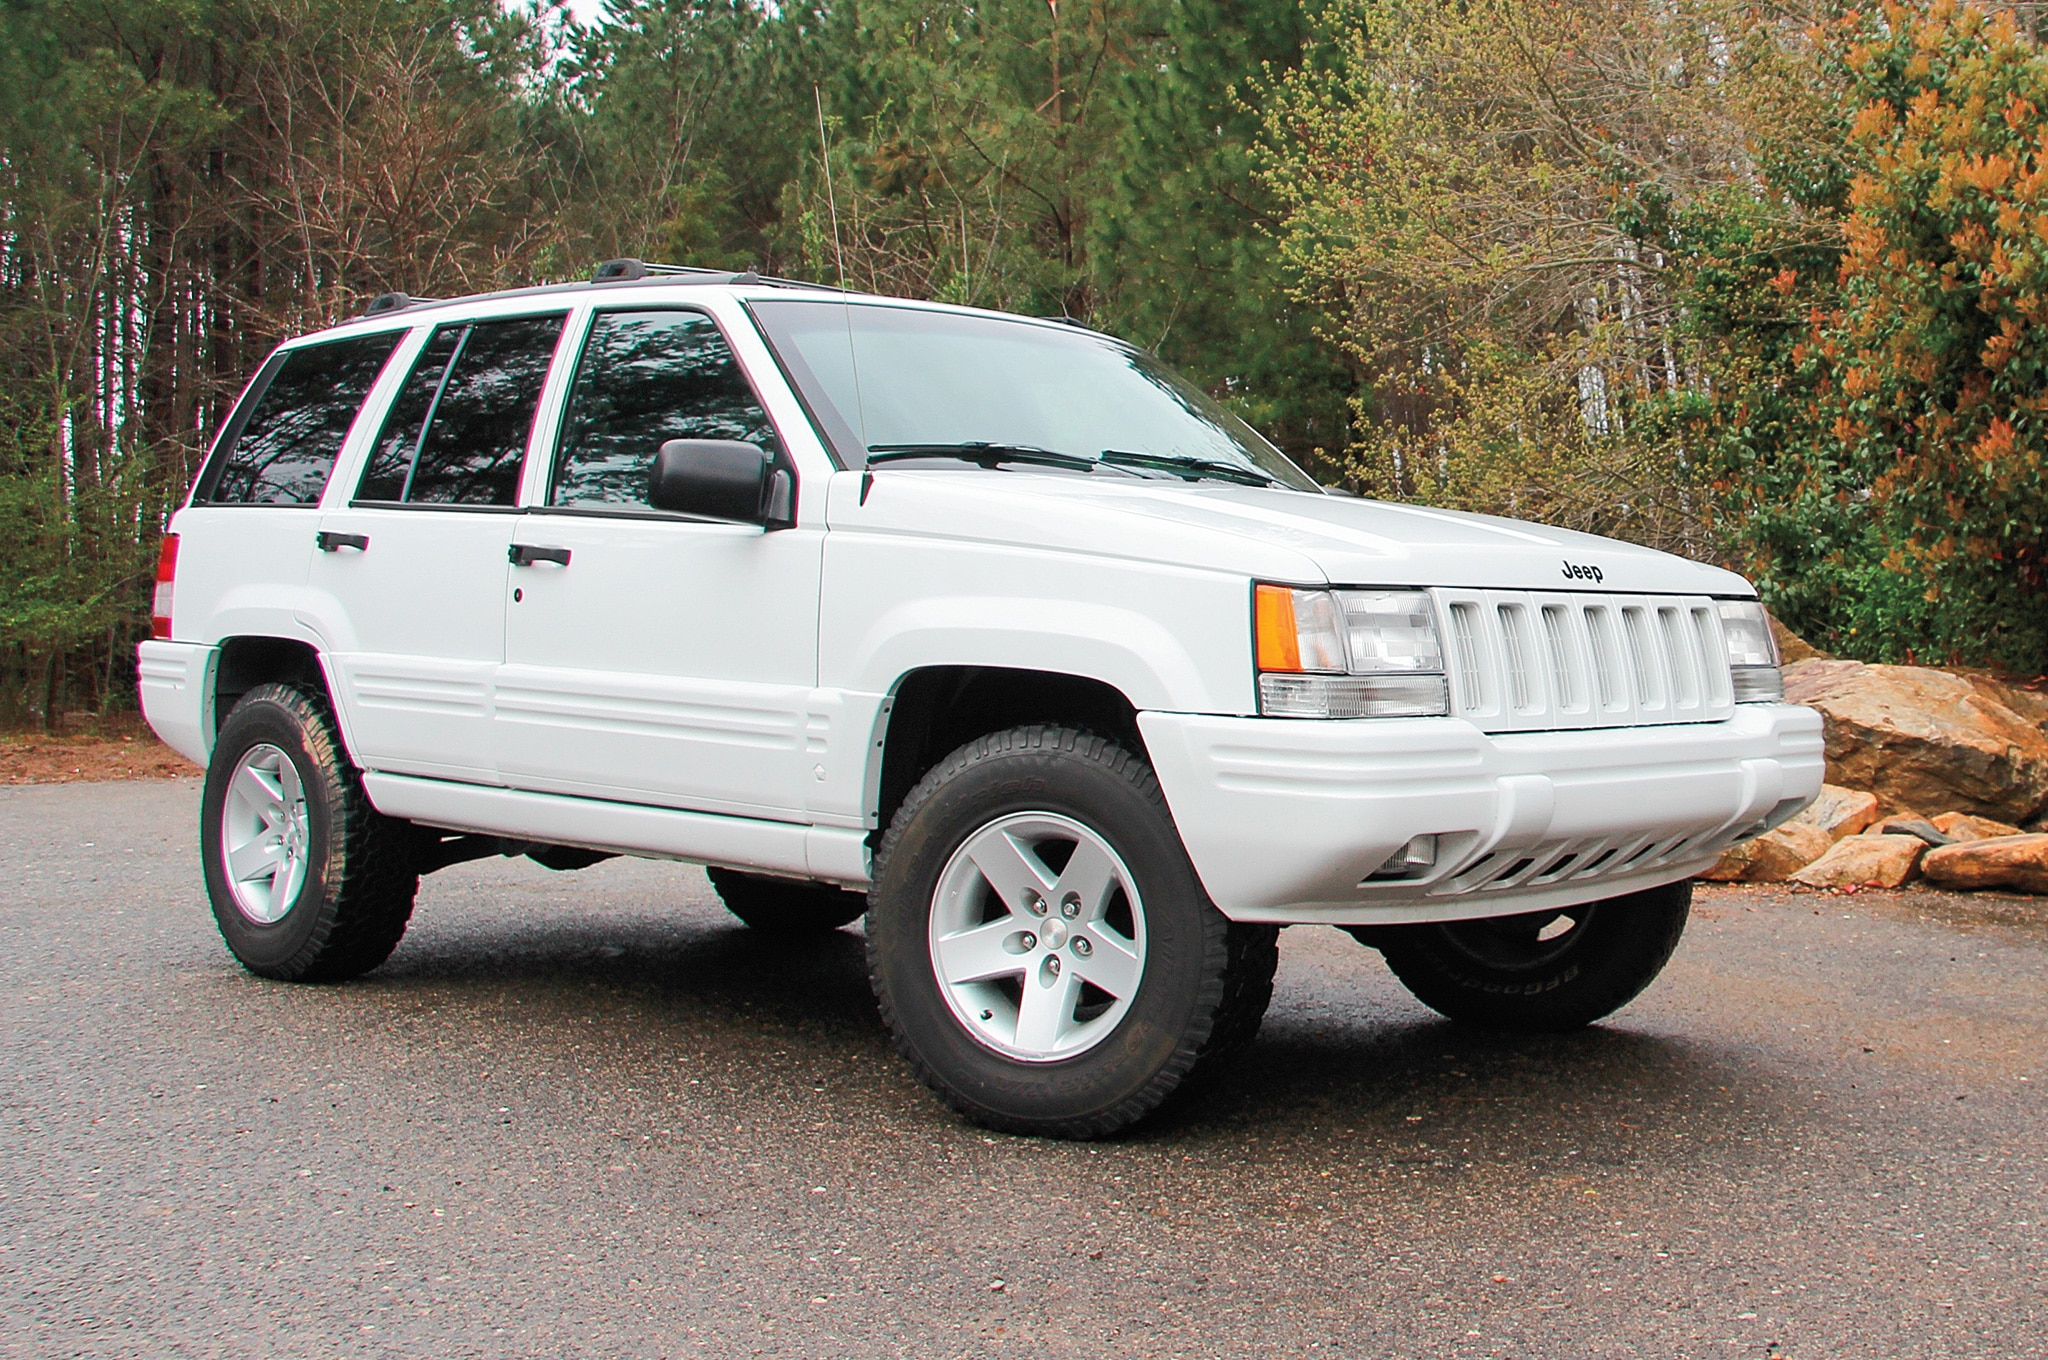 1998 Jeep Grand Cherokee ZJ front three quarter